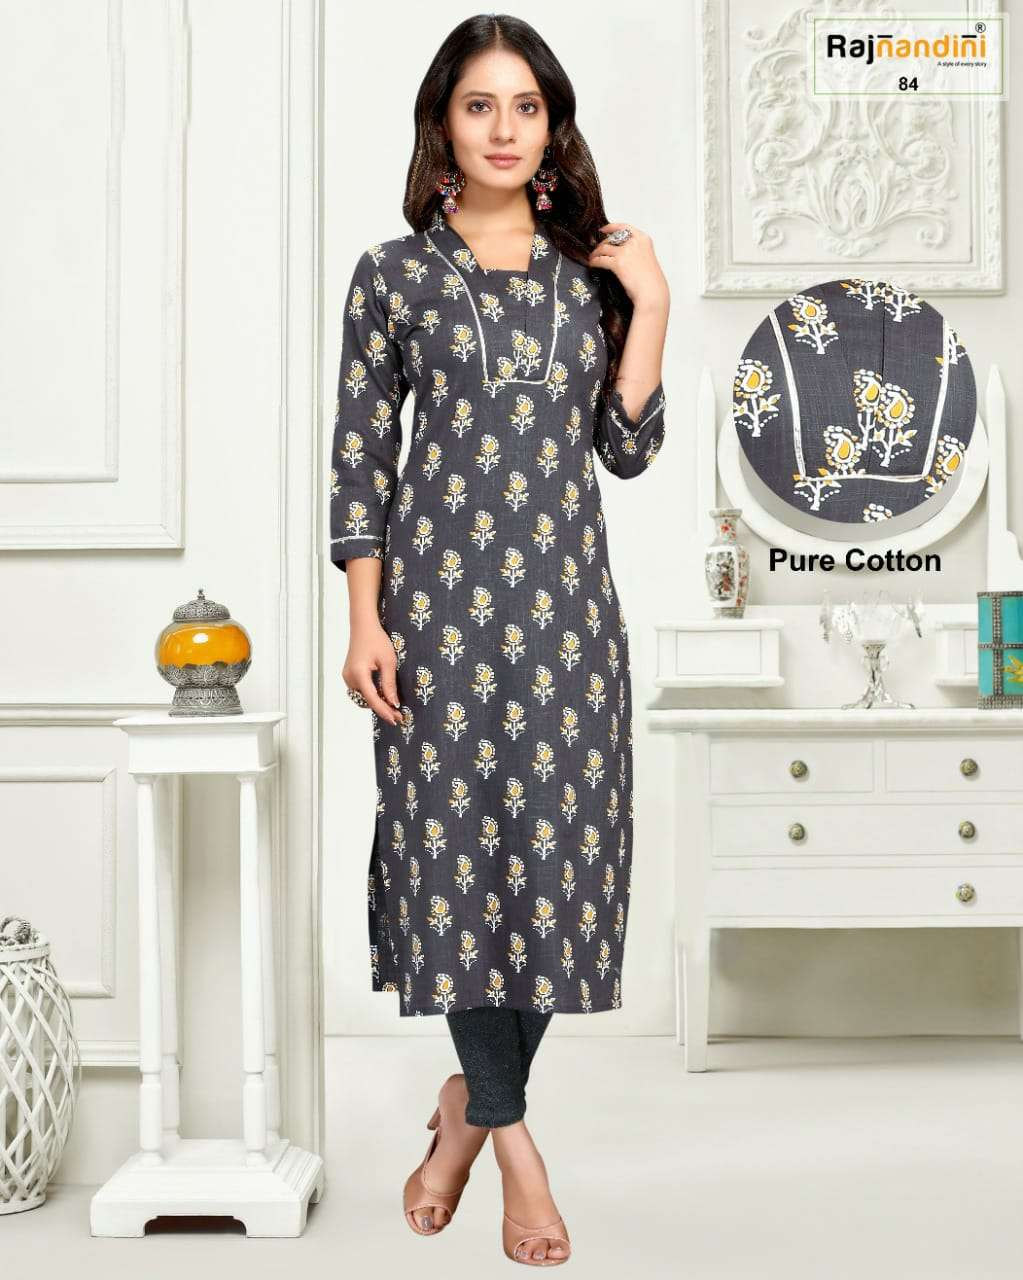 Rajnandini Vol 28 Regular Wear Cotton Kurti New Designs In Wholesale Rate